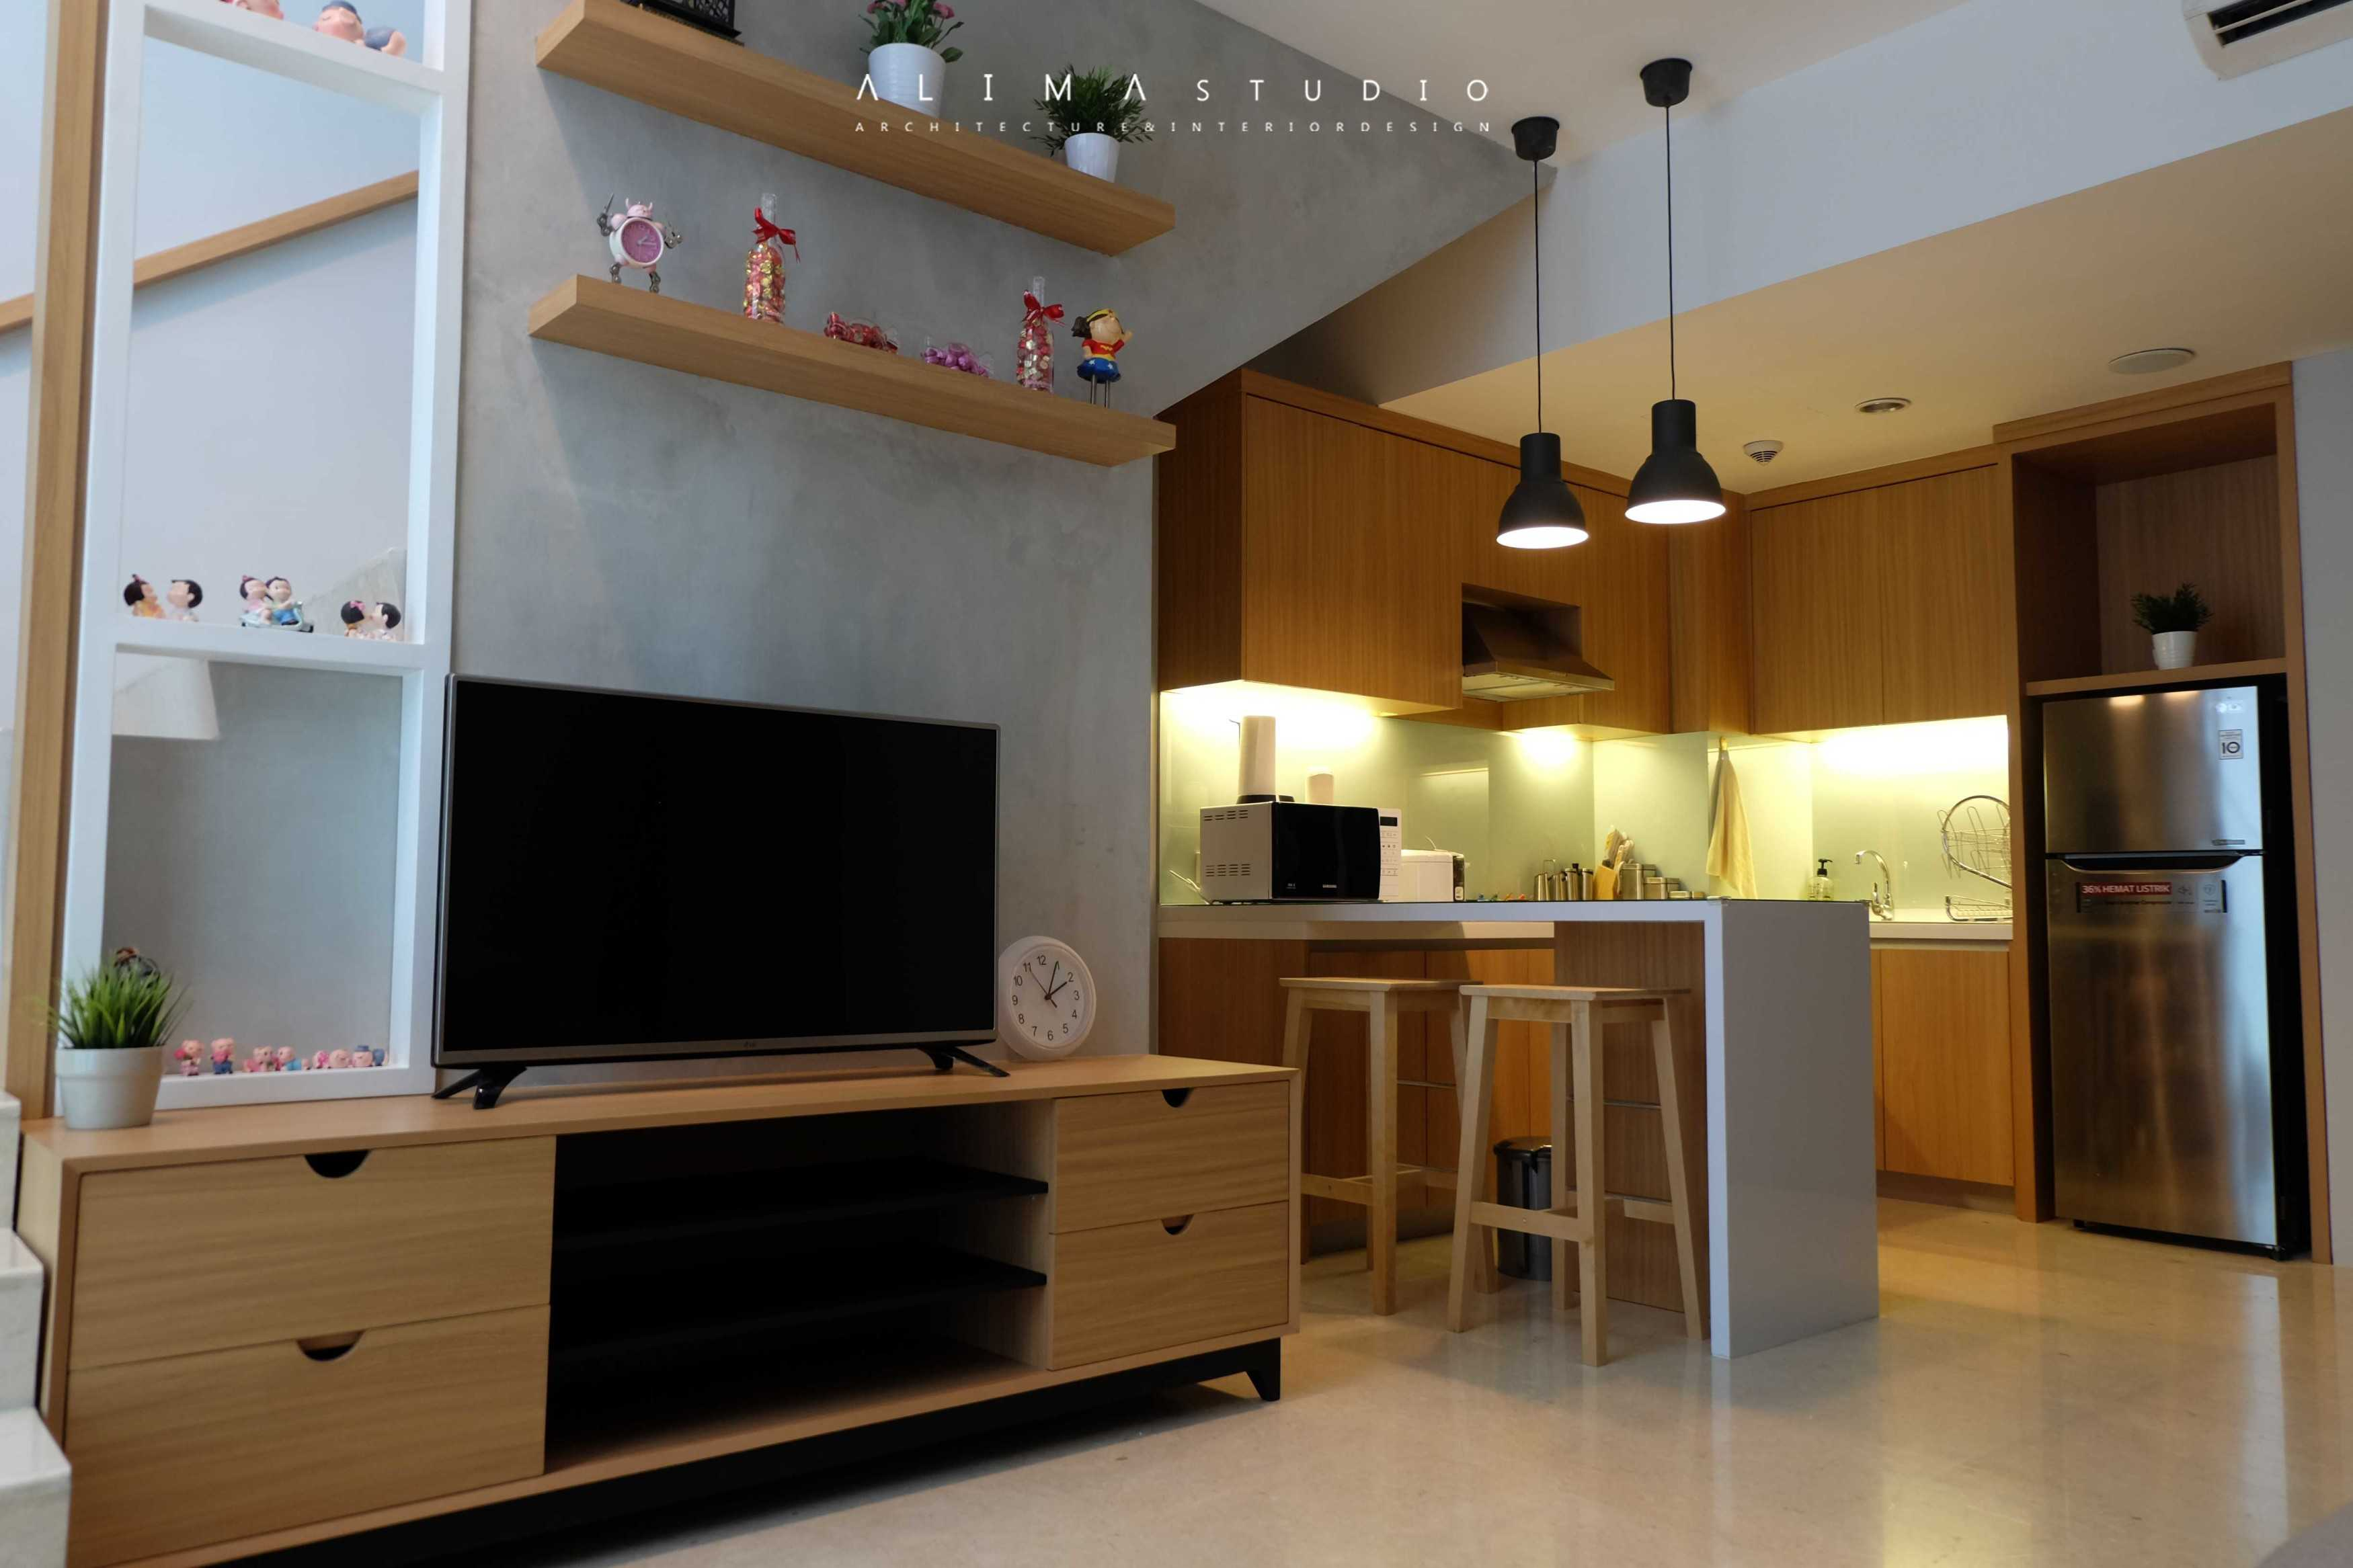 Alima Studio Apartment Satu8 Kedoya Selatan, Jakarta, Indonesia Kedoya Selatan, Jakarta, Indonesia Dscf8066-W Skandinavia  30629